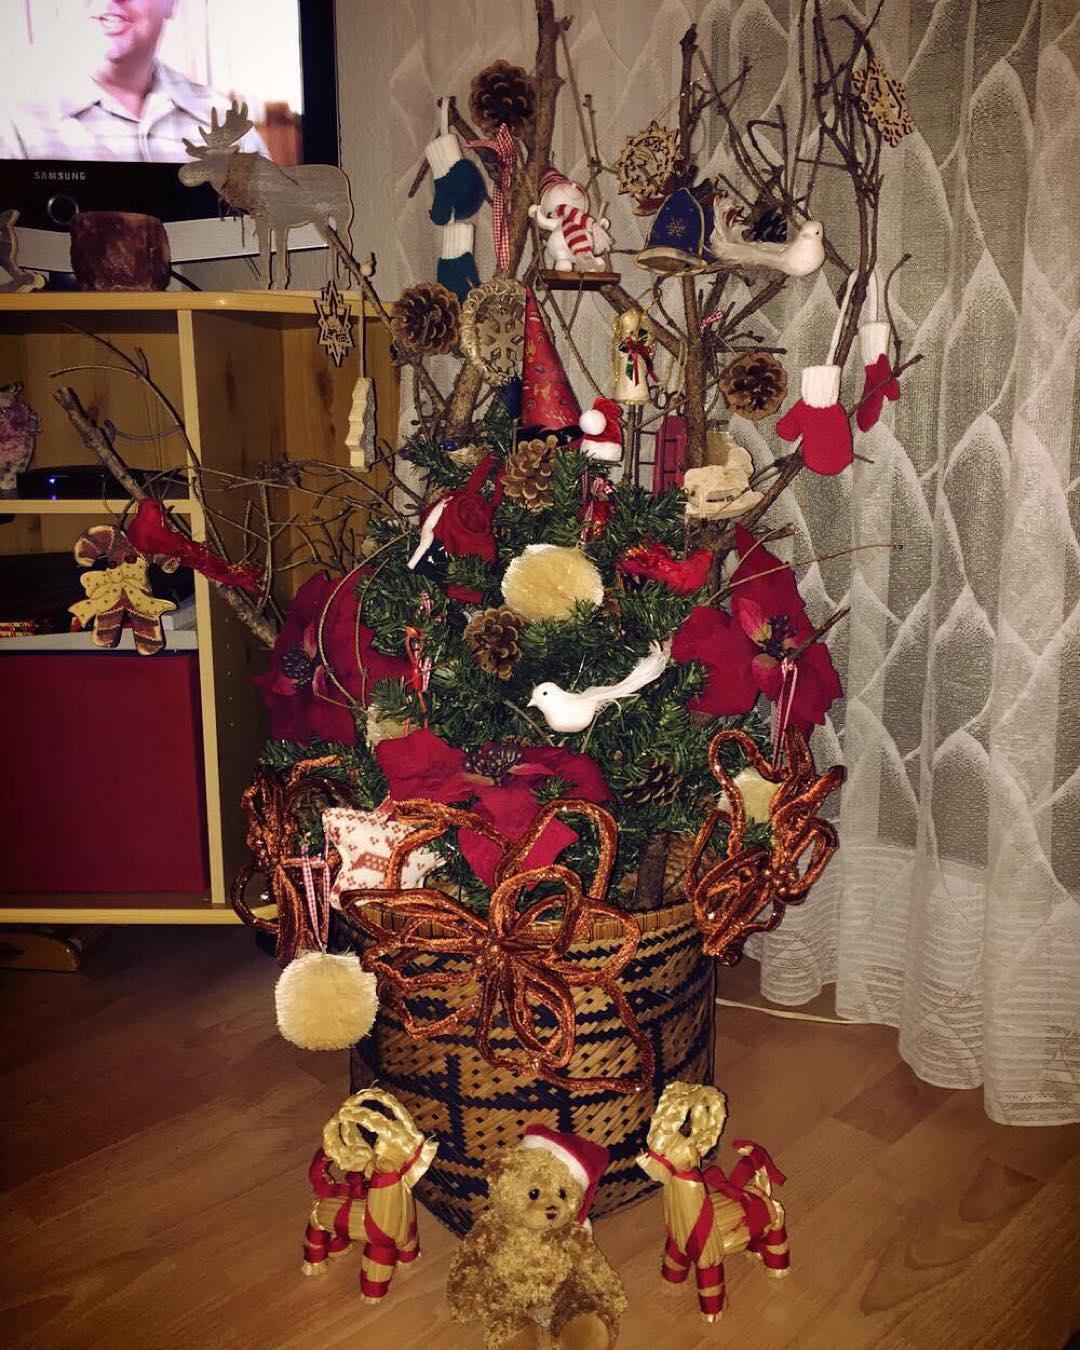 Cute Artistic Christmas Tree Decor